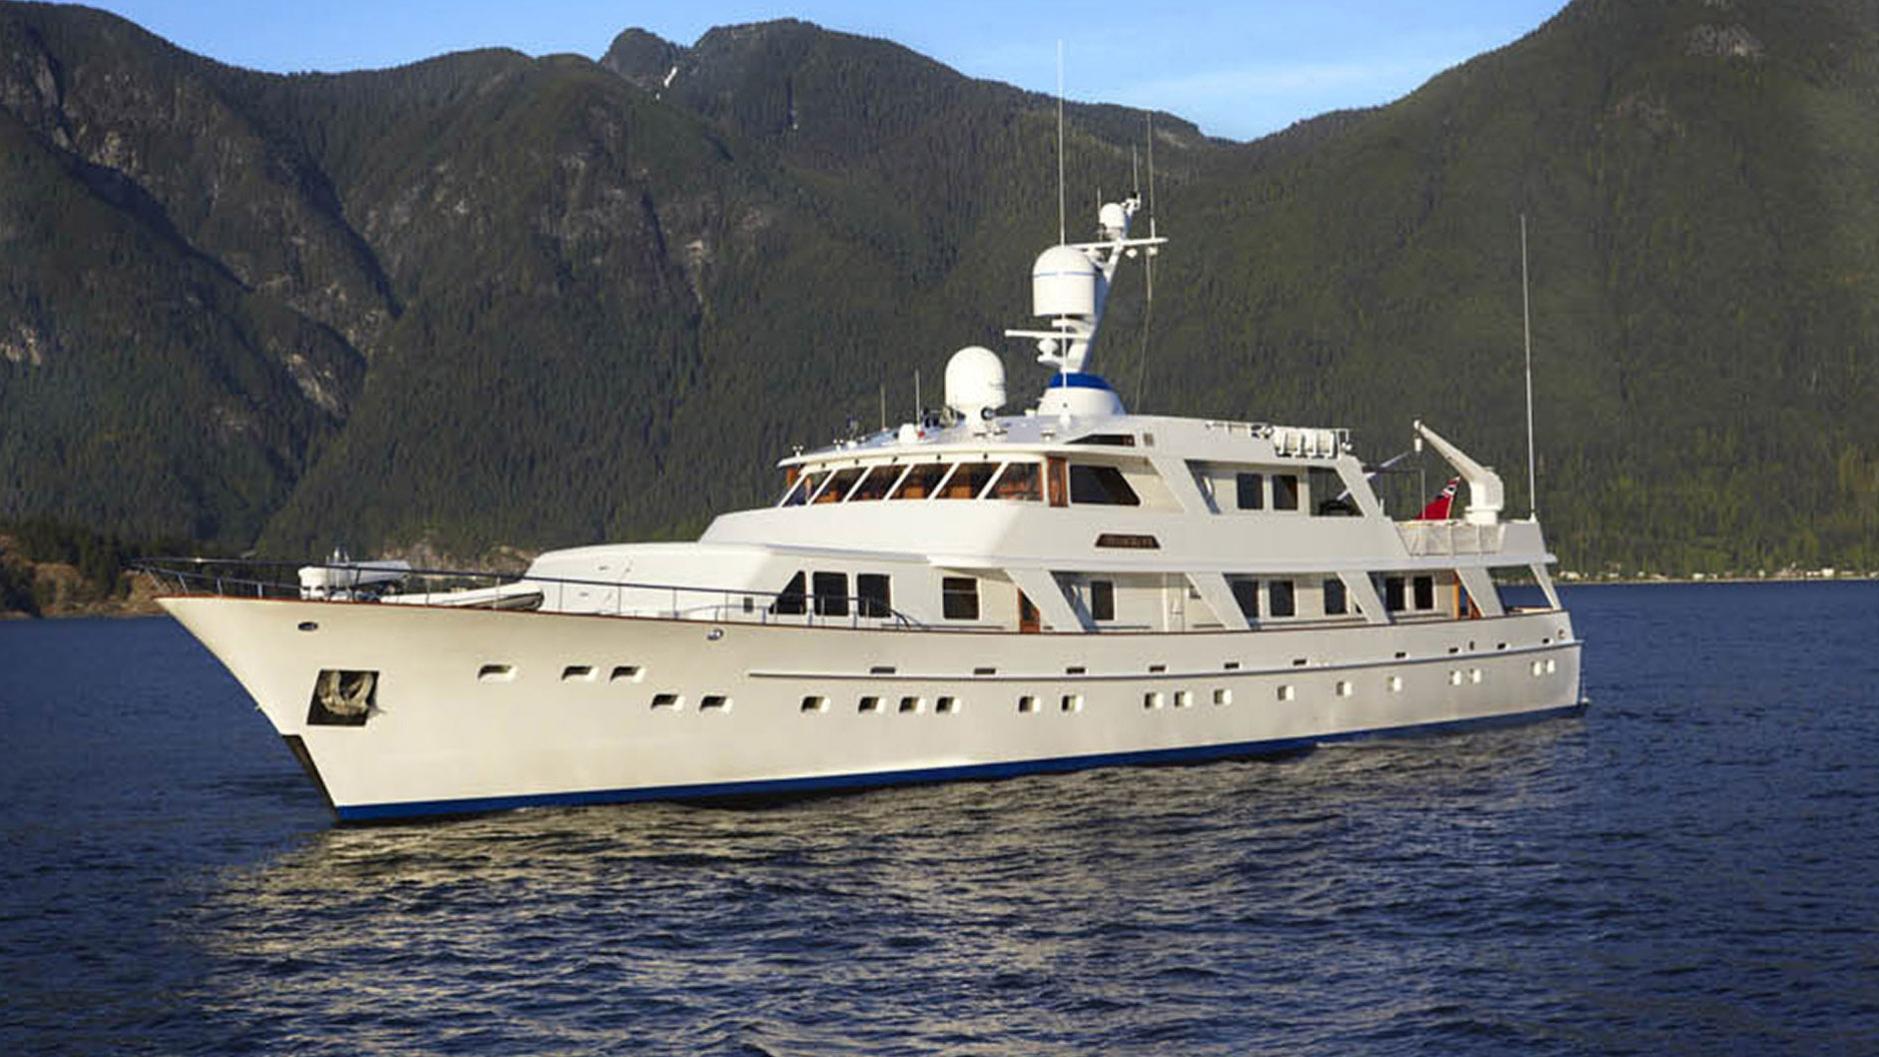 strangelove-yacht-for-sale-profile